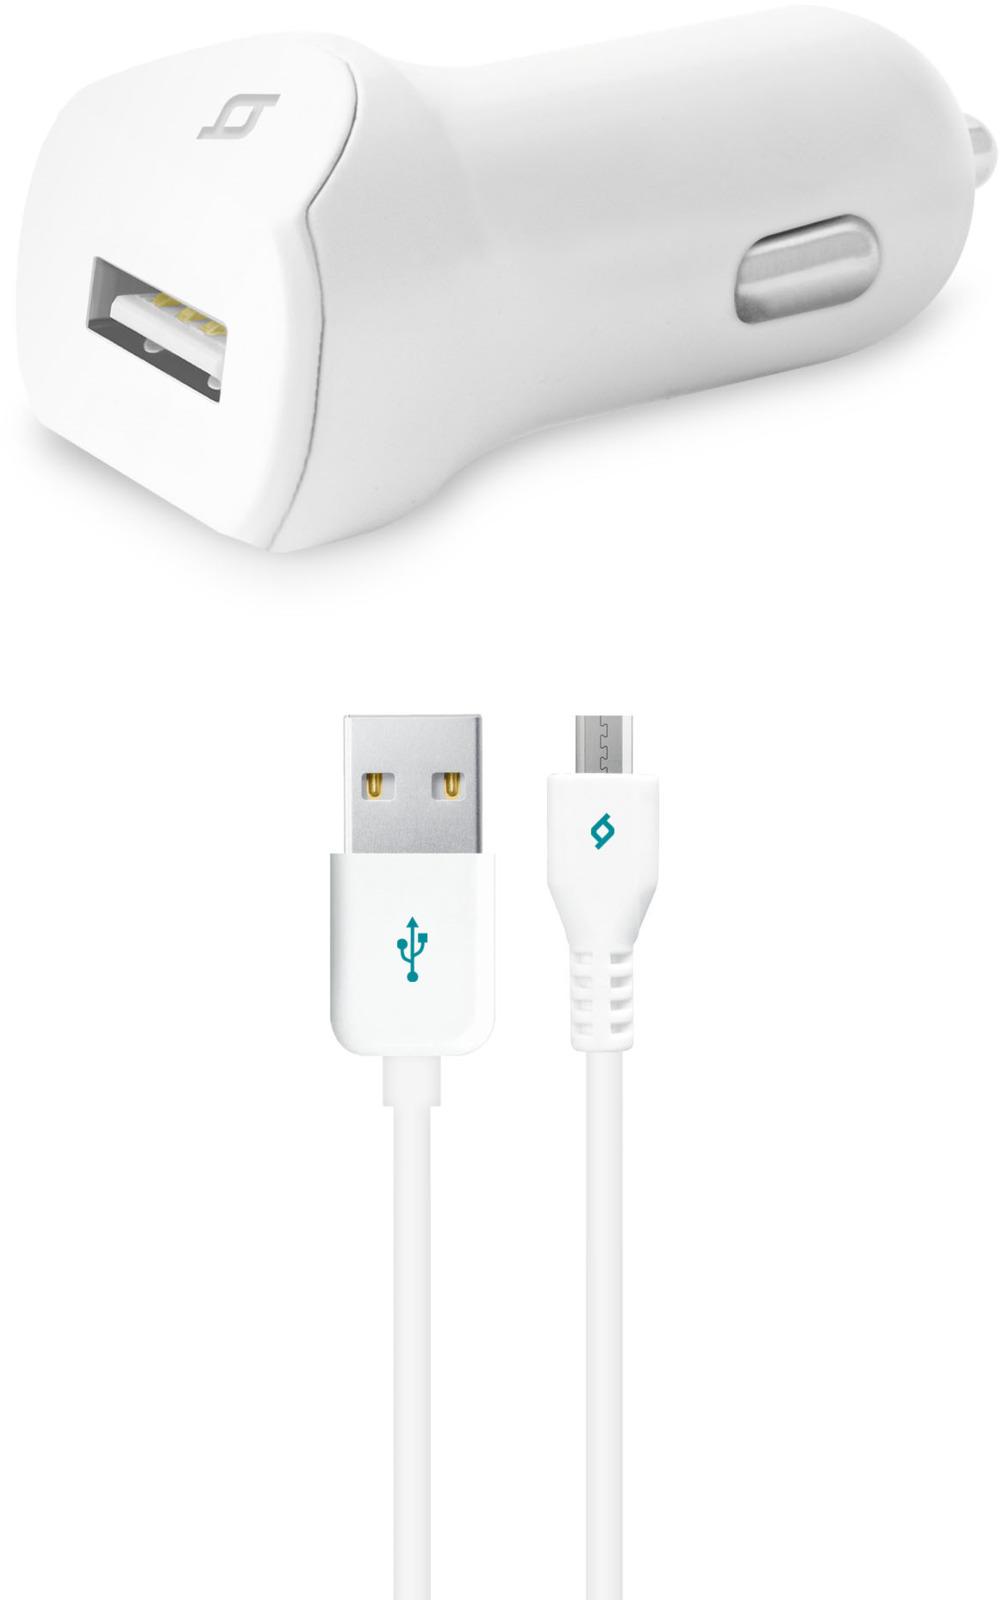 Автомобильное зарядное устройство TTEC SpeedCharger USB-micro USB, 2.1A, цвет: белый digital dental sensor rvg with twain driver dental x ray sensor ateco dental x ray image sensor